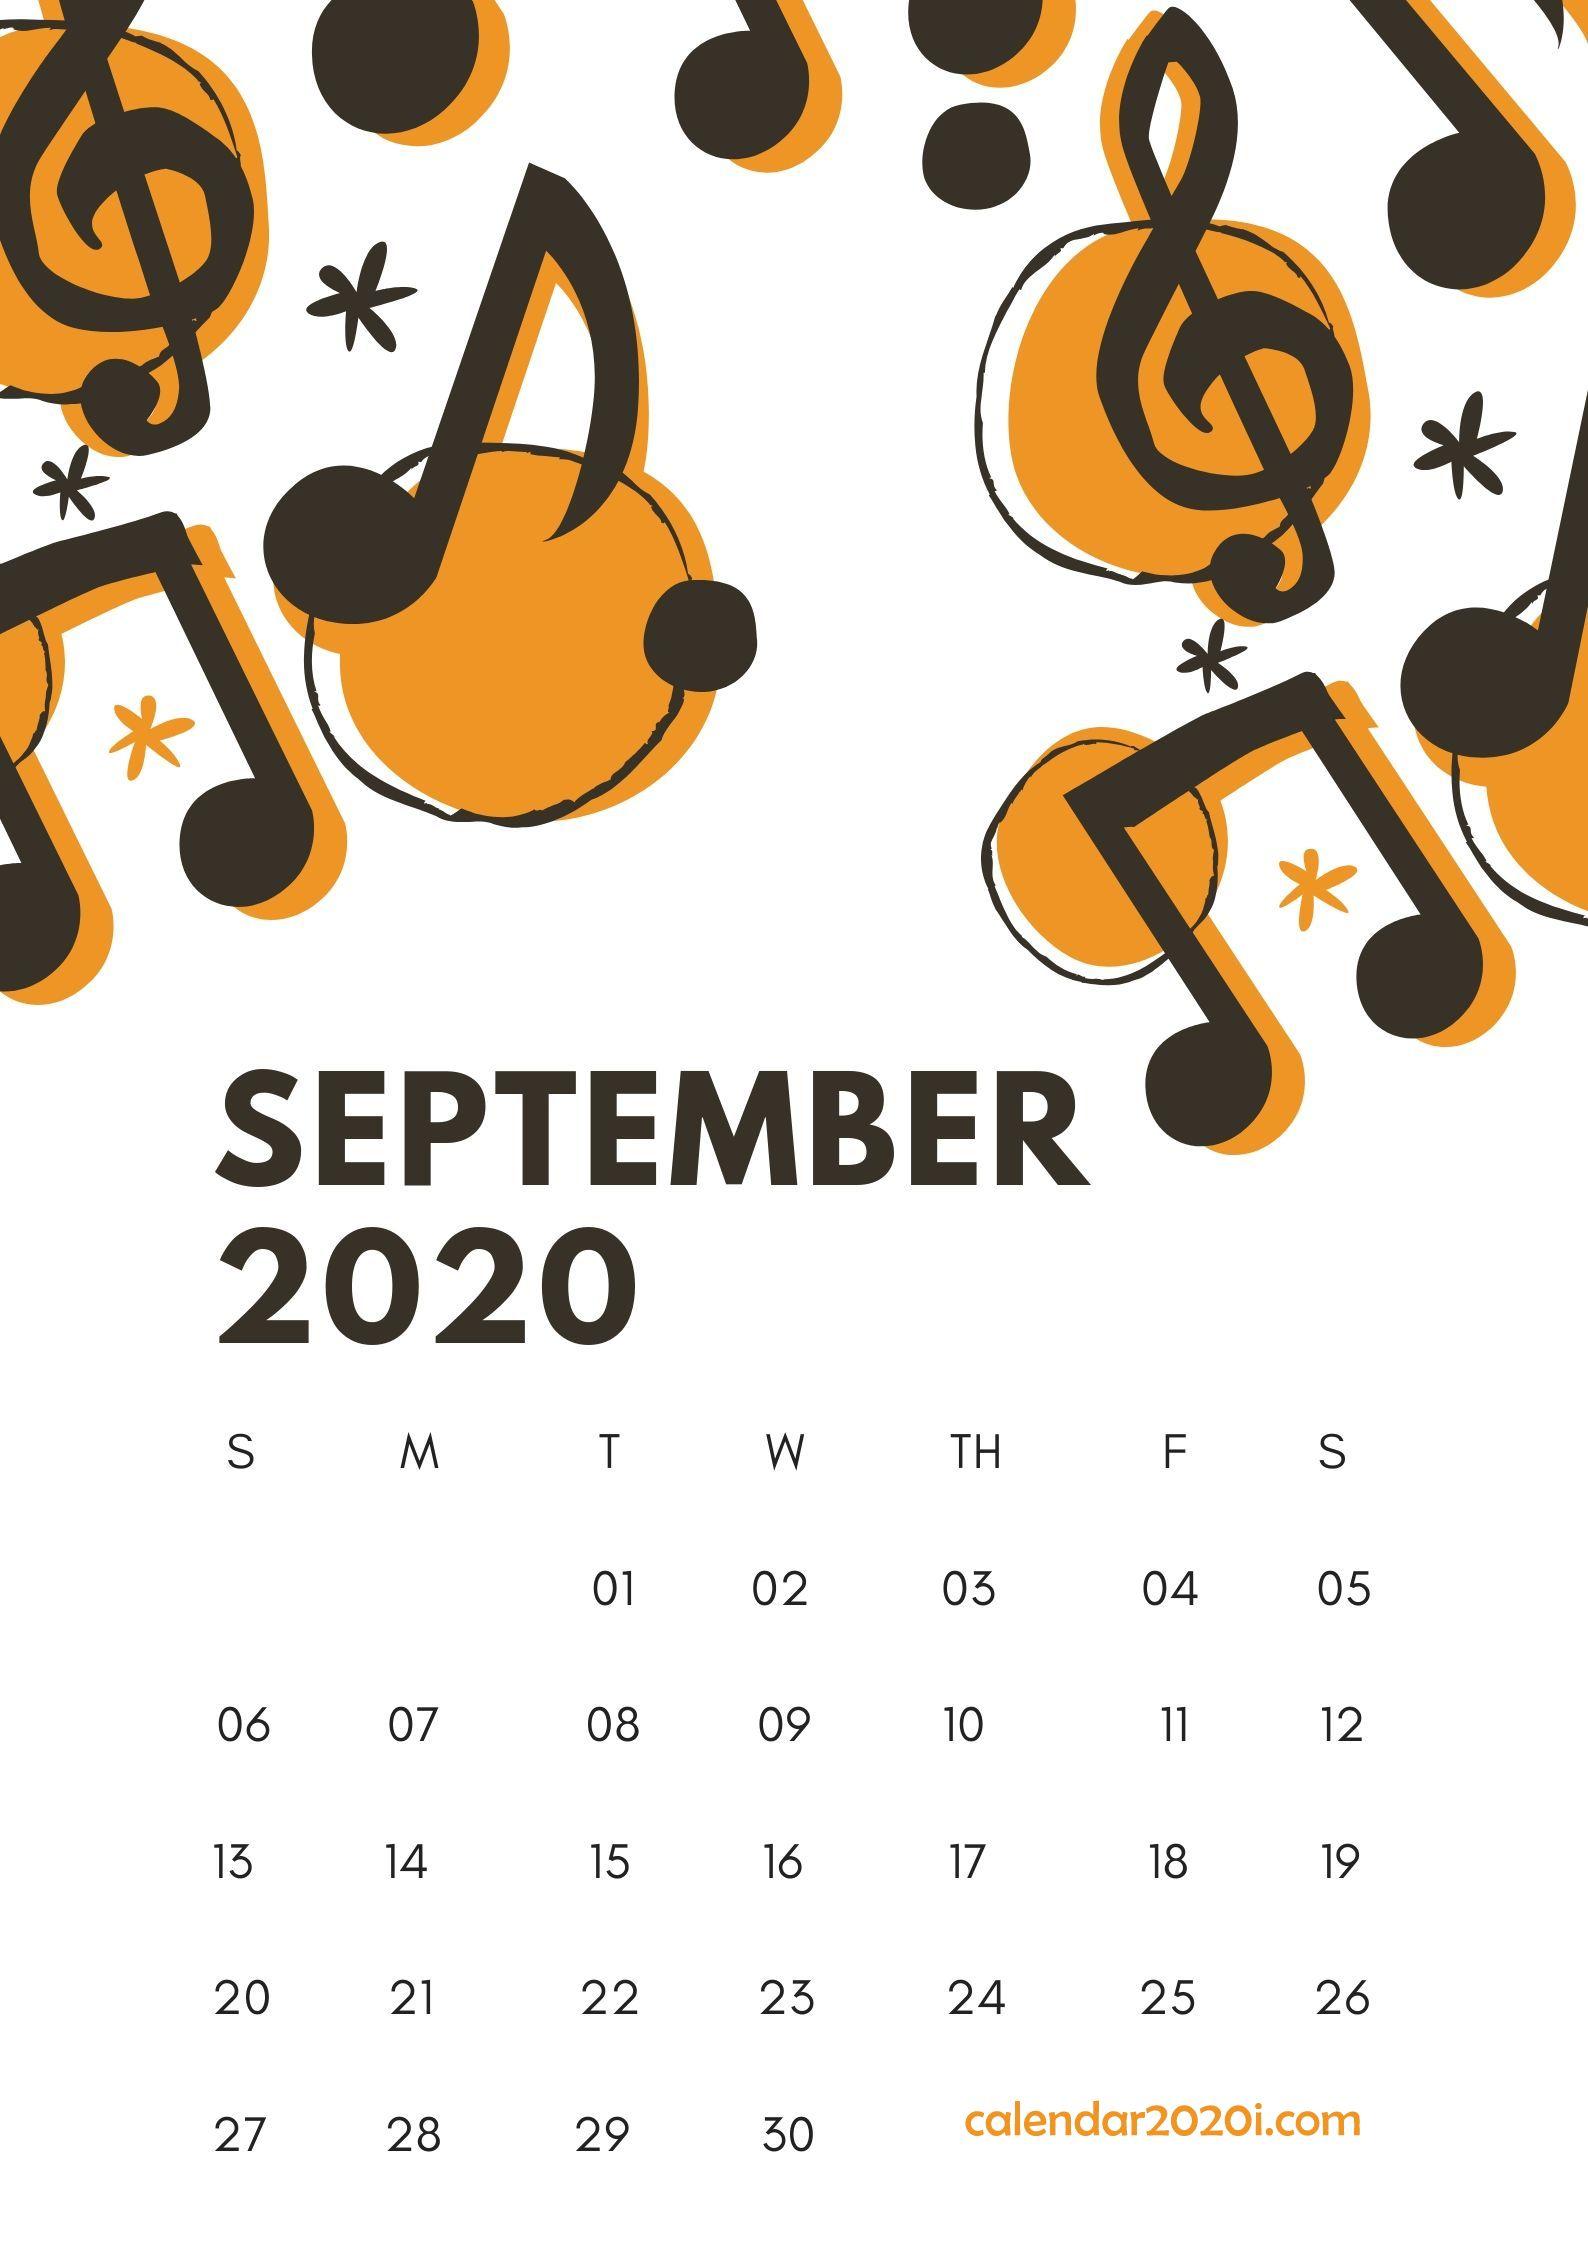 September 2020 Wall Calendar Printable